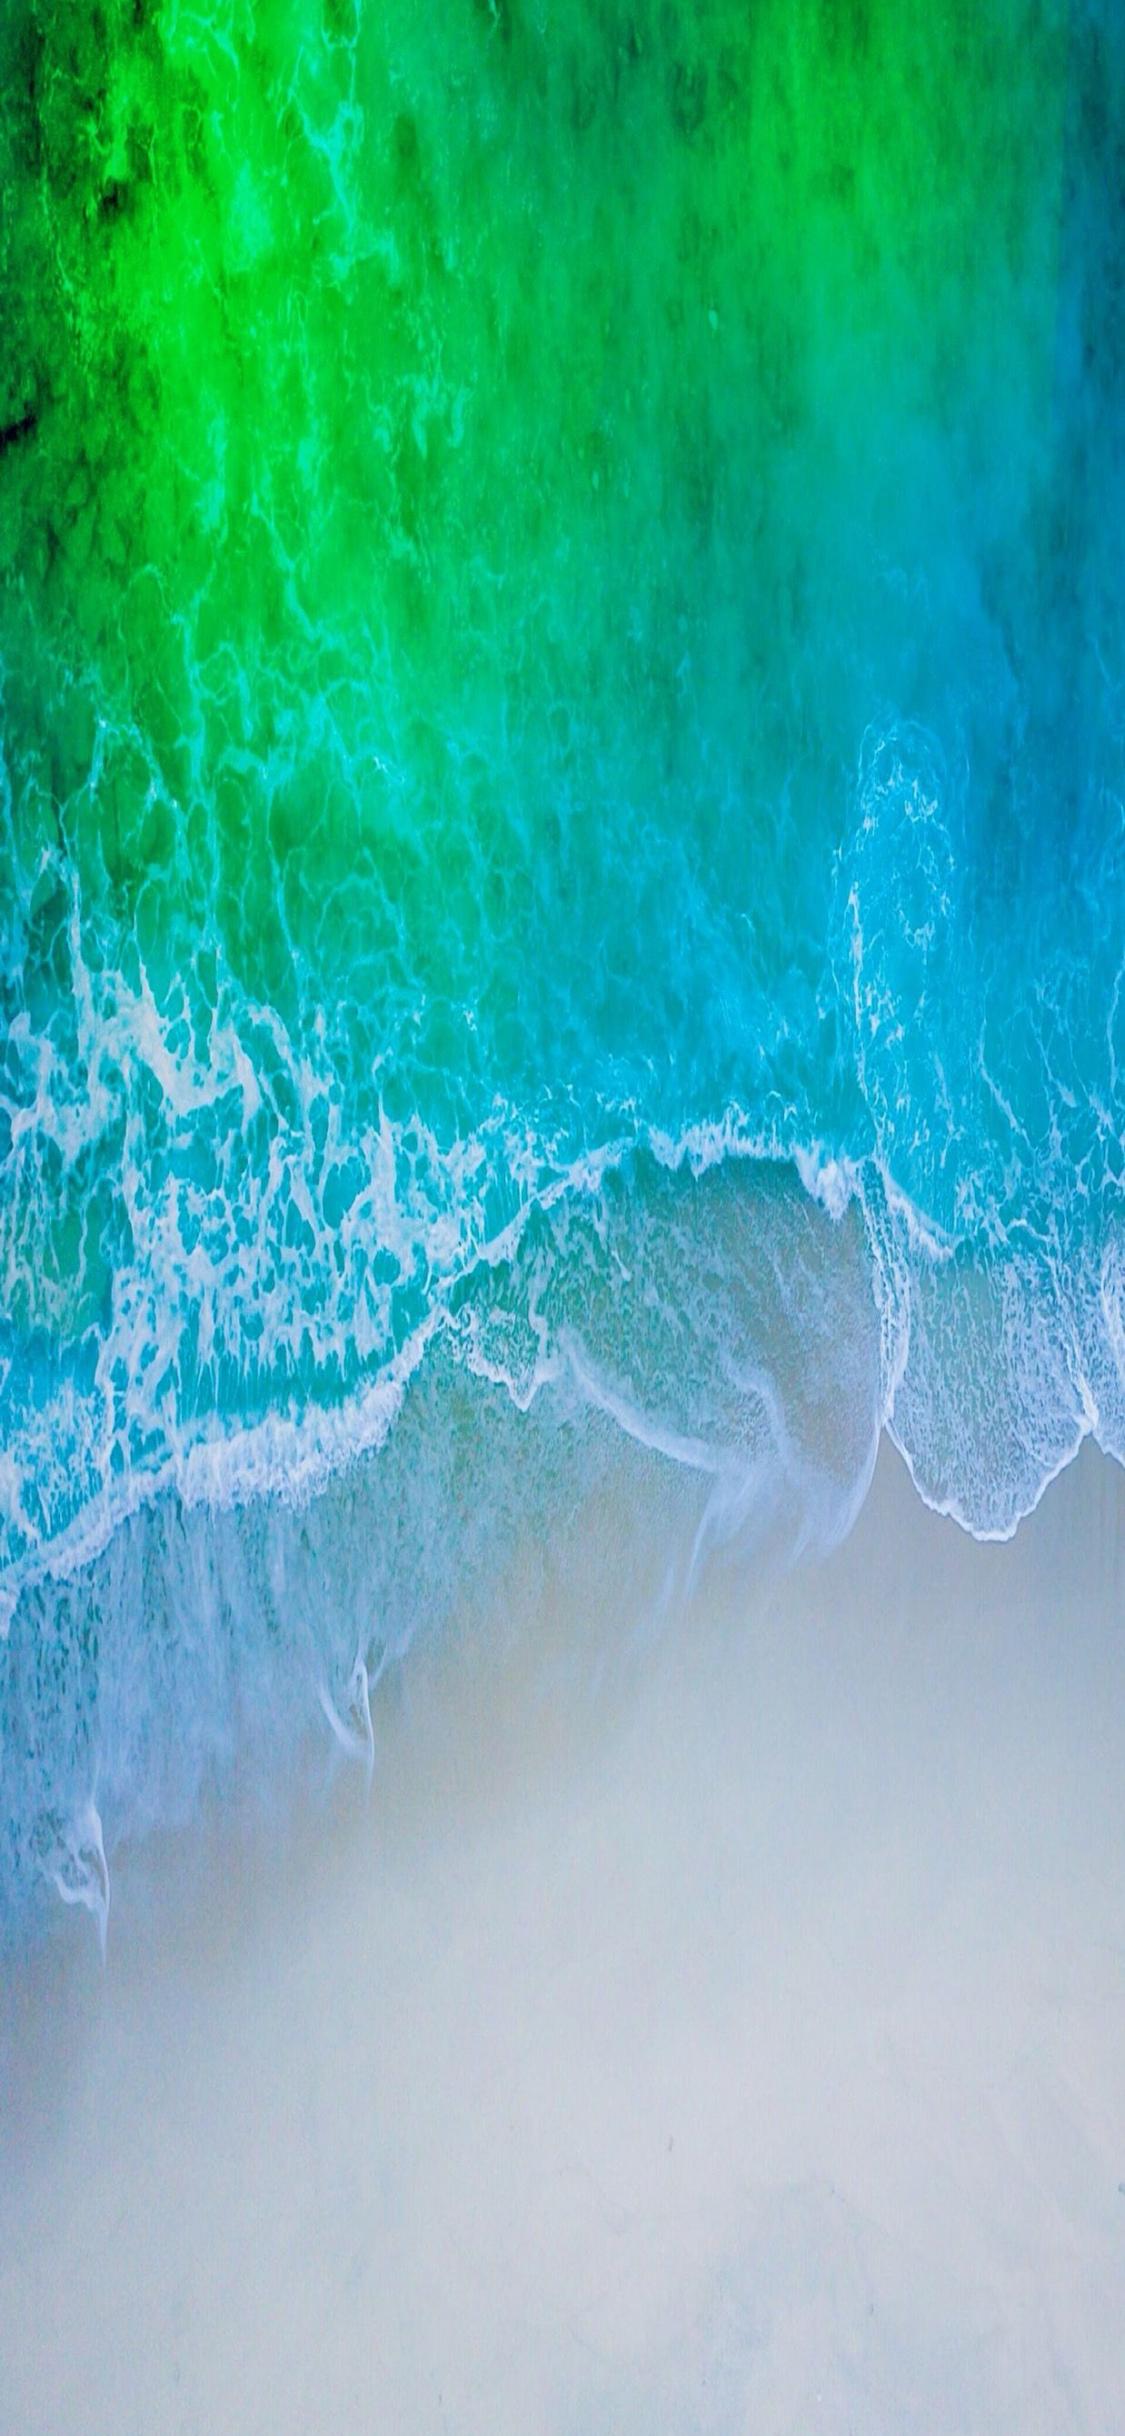 Free Download Ios 11 Iphone X Aqua Blue Water Beach Wave Ocean Apple 1238x2800 For Your Desktop Mobile Tablet Explore 54 Iphone 11 Wallpapers Iphone 11 Wallpapers 11 Iphone Wallpaper Ios Great Iphone 11 Wallpapers